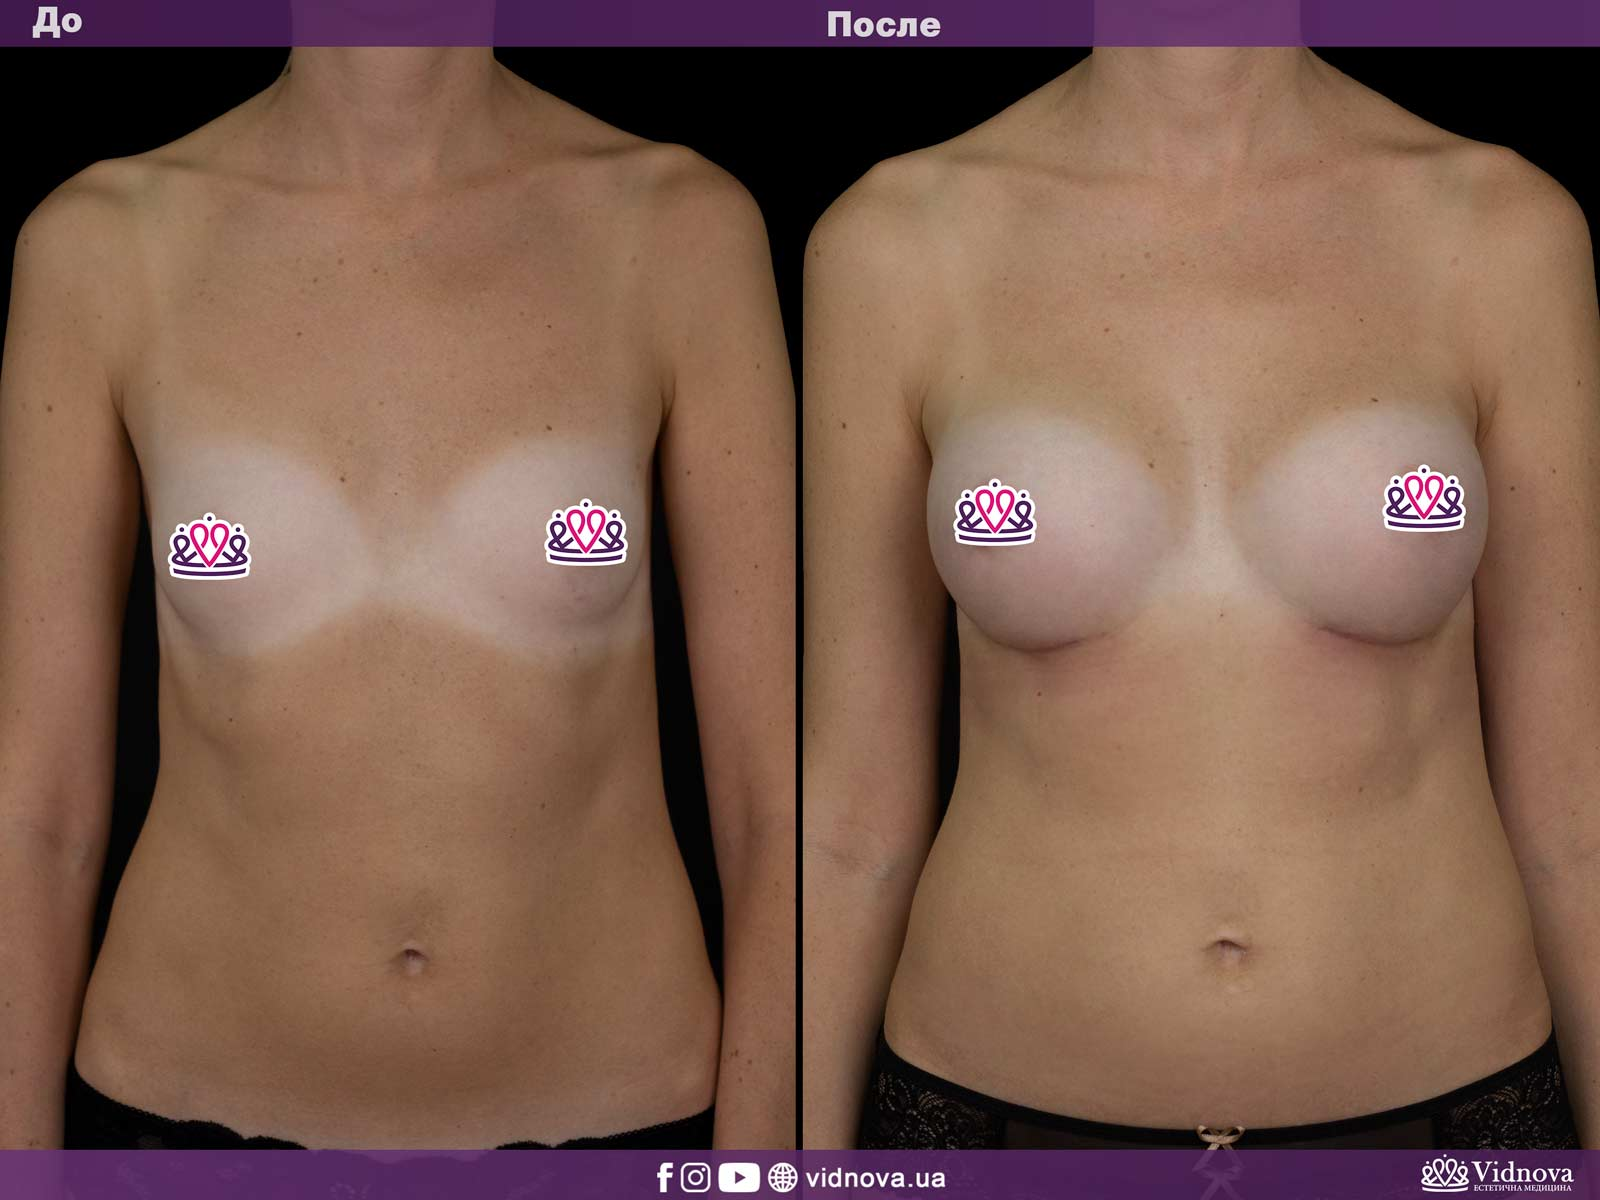 Увеличение груди: Фото ДО и ПОСЛЕ - Пример №11-1 - Клиника Vidnova